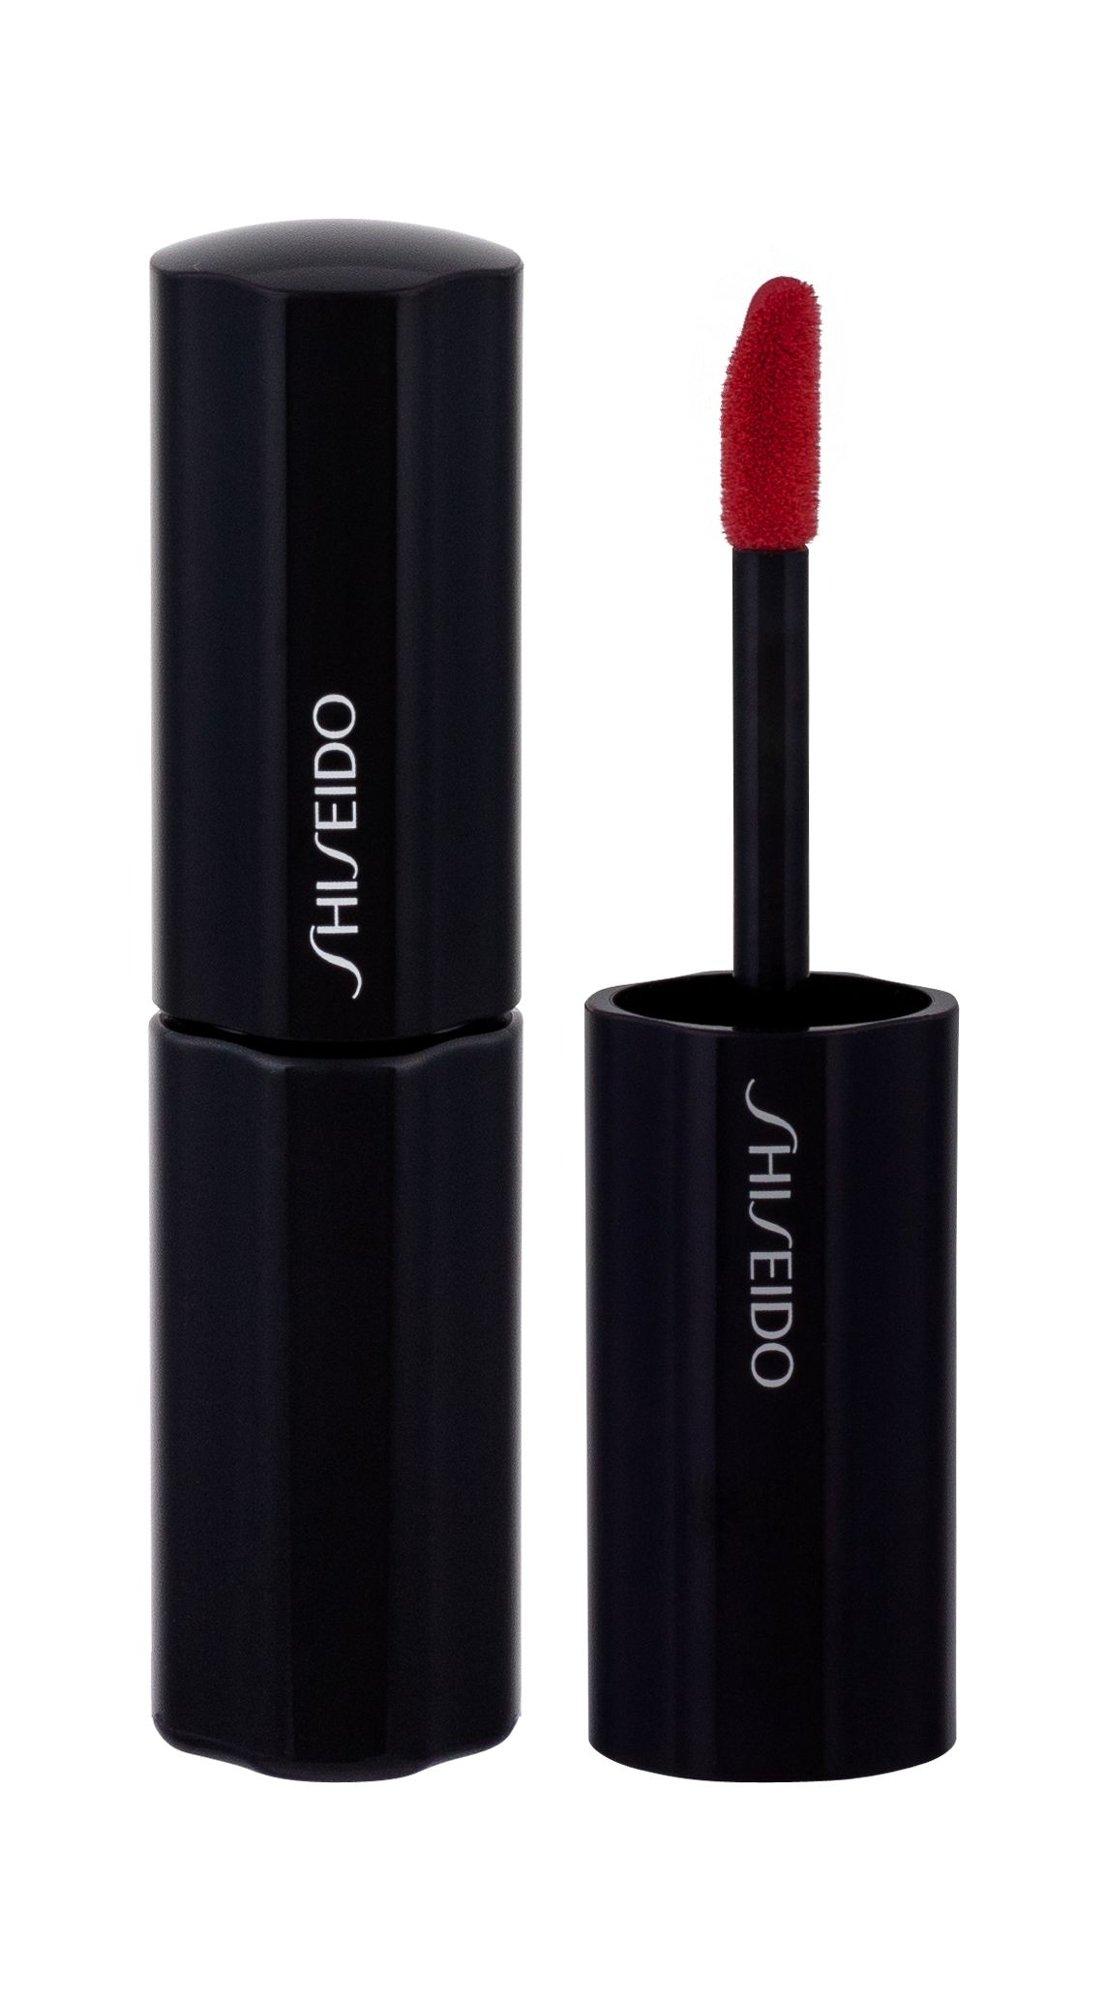 Shiseido Lacquer Rouge Lipstick 6ml RD607